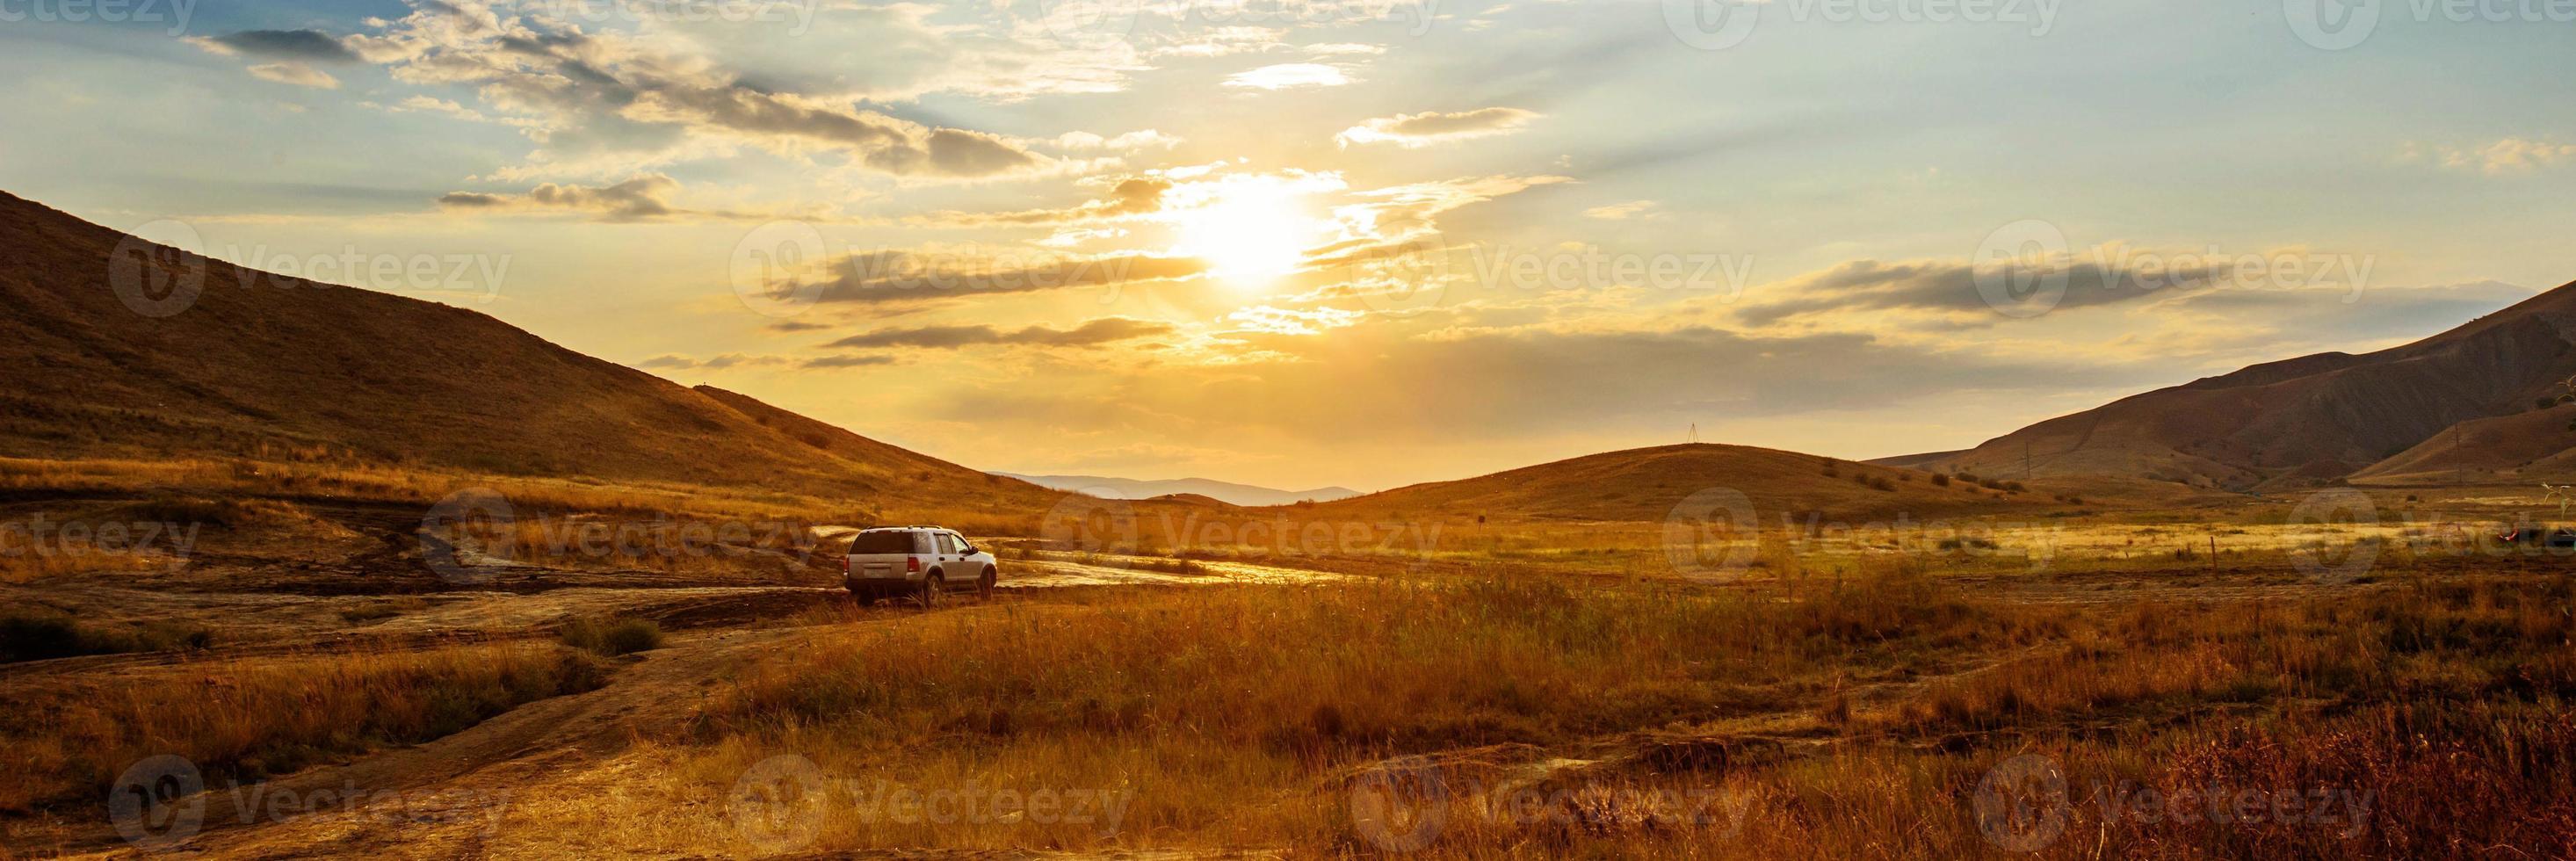 bil vid solnedgången foto